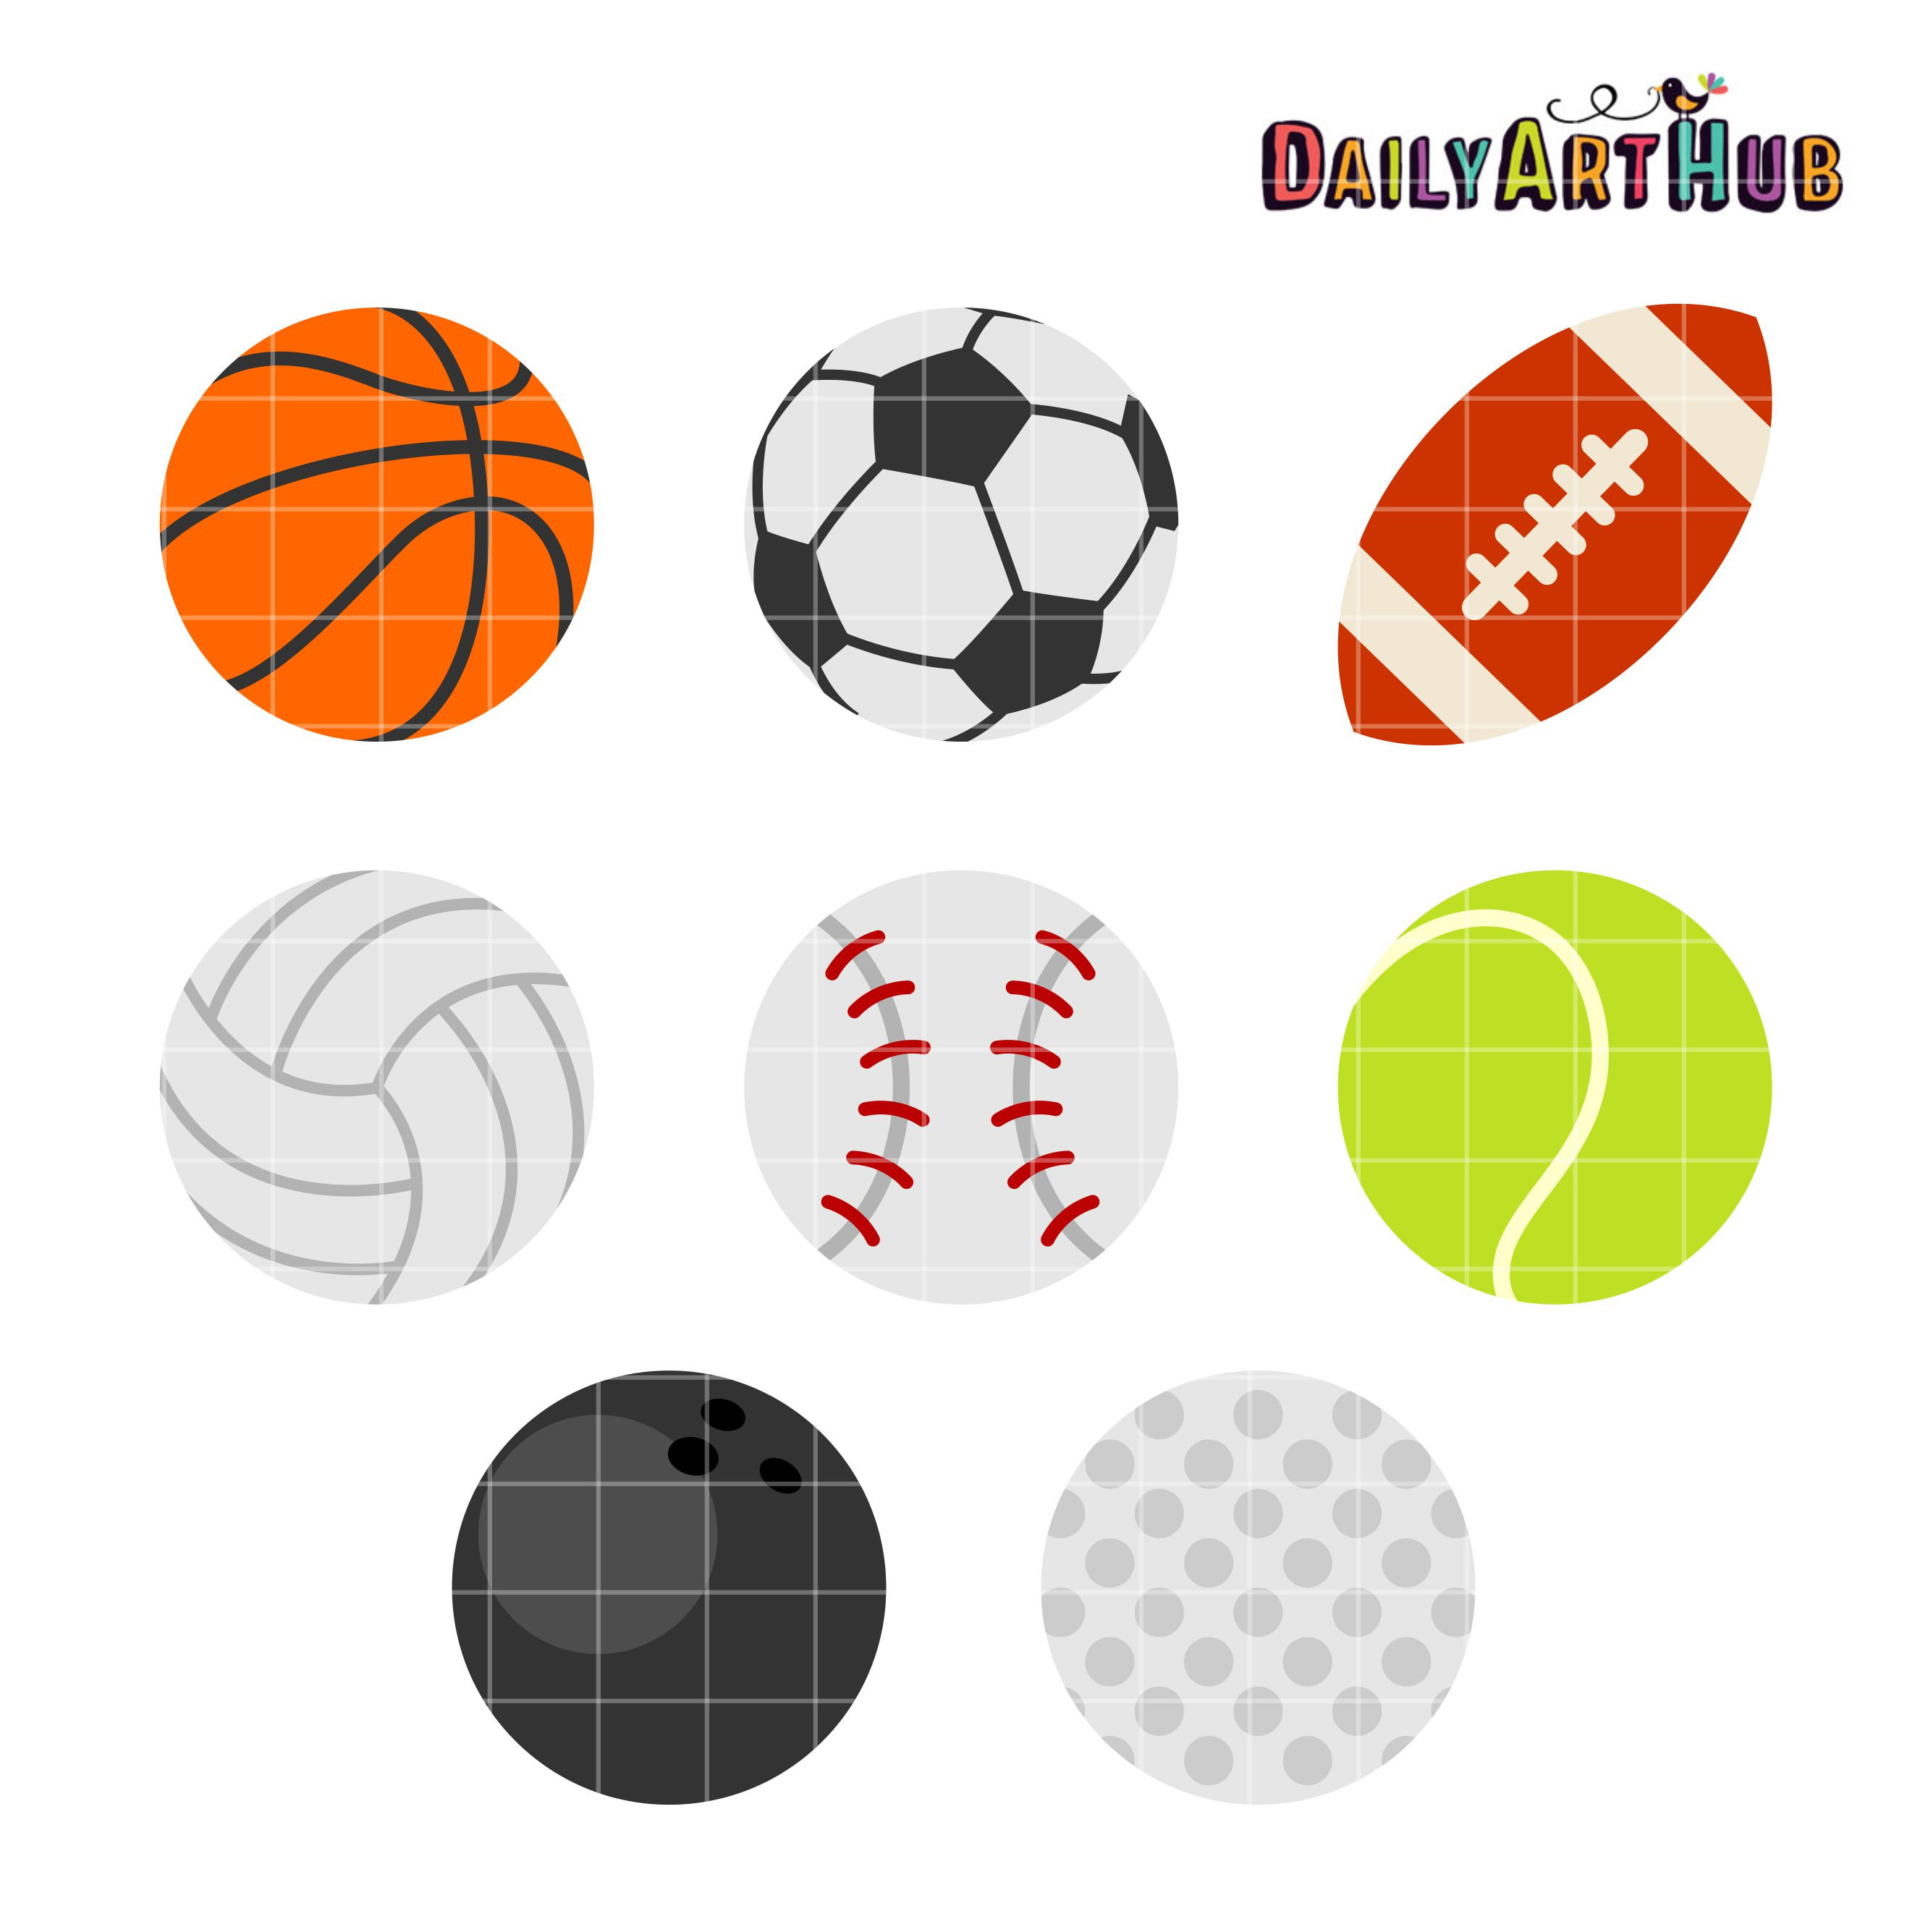 Sports Balls Clip Art Set | Daily Art Hub